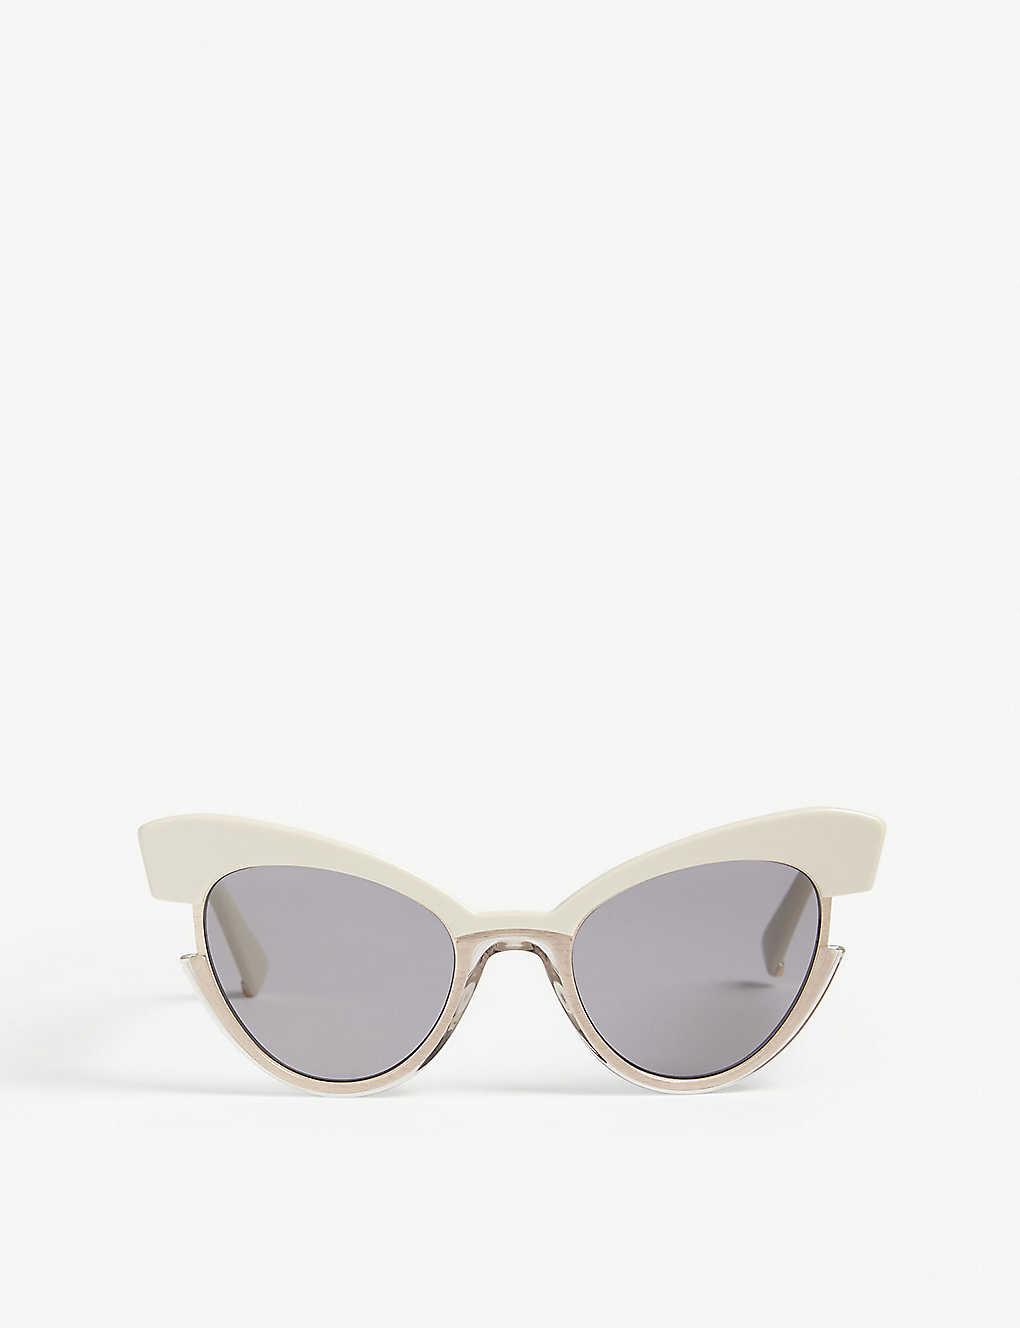 7ac81b7e7417 MAX MARA - Ingrid cat-eye sunglasses   Selfridges.com